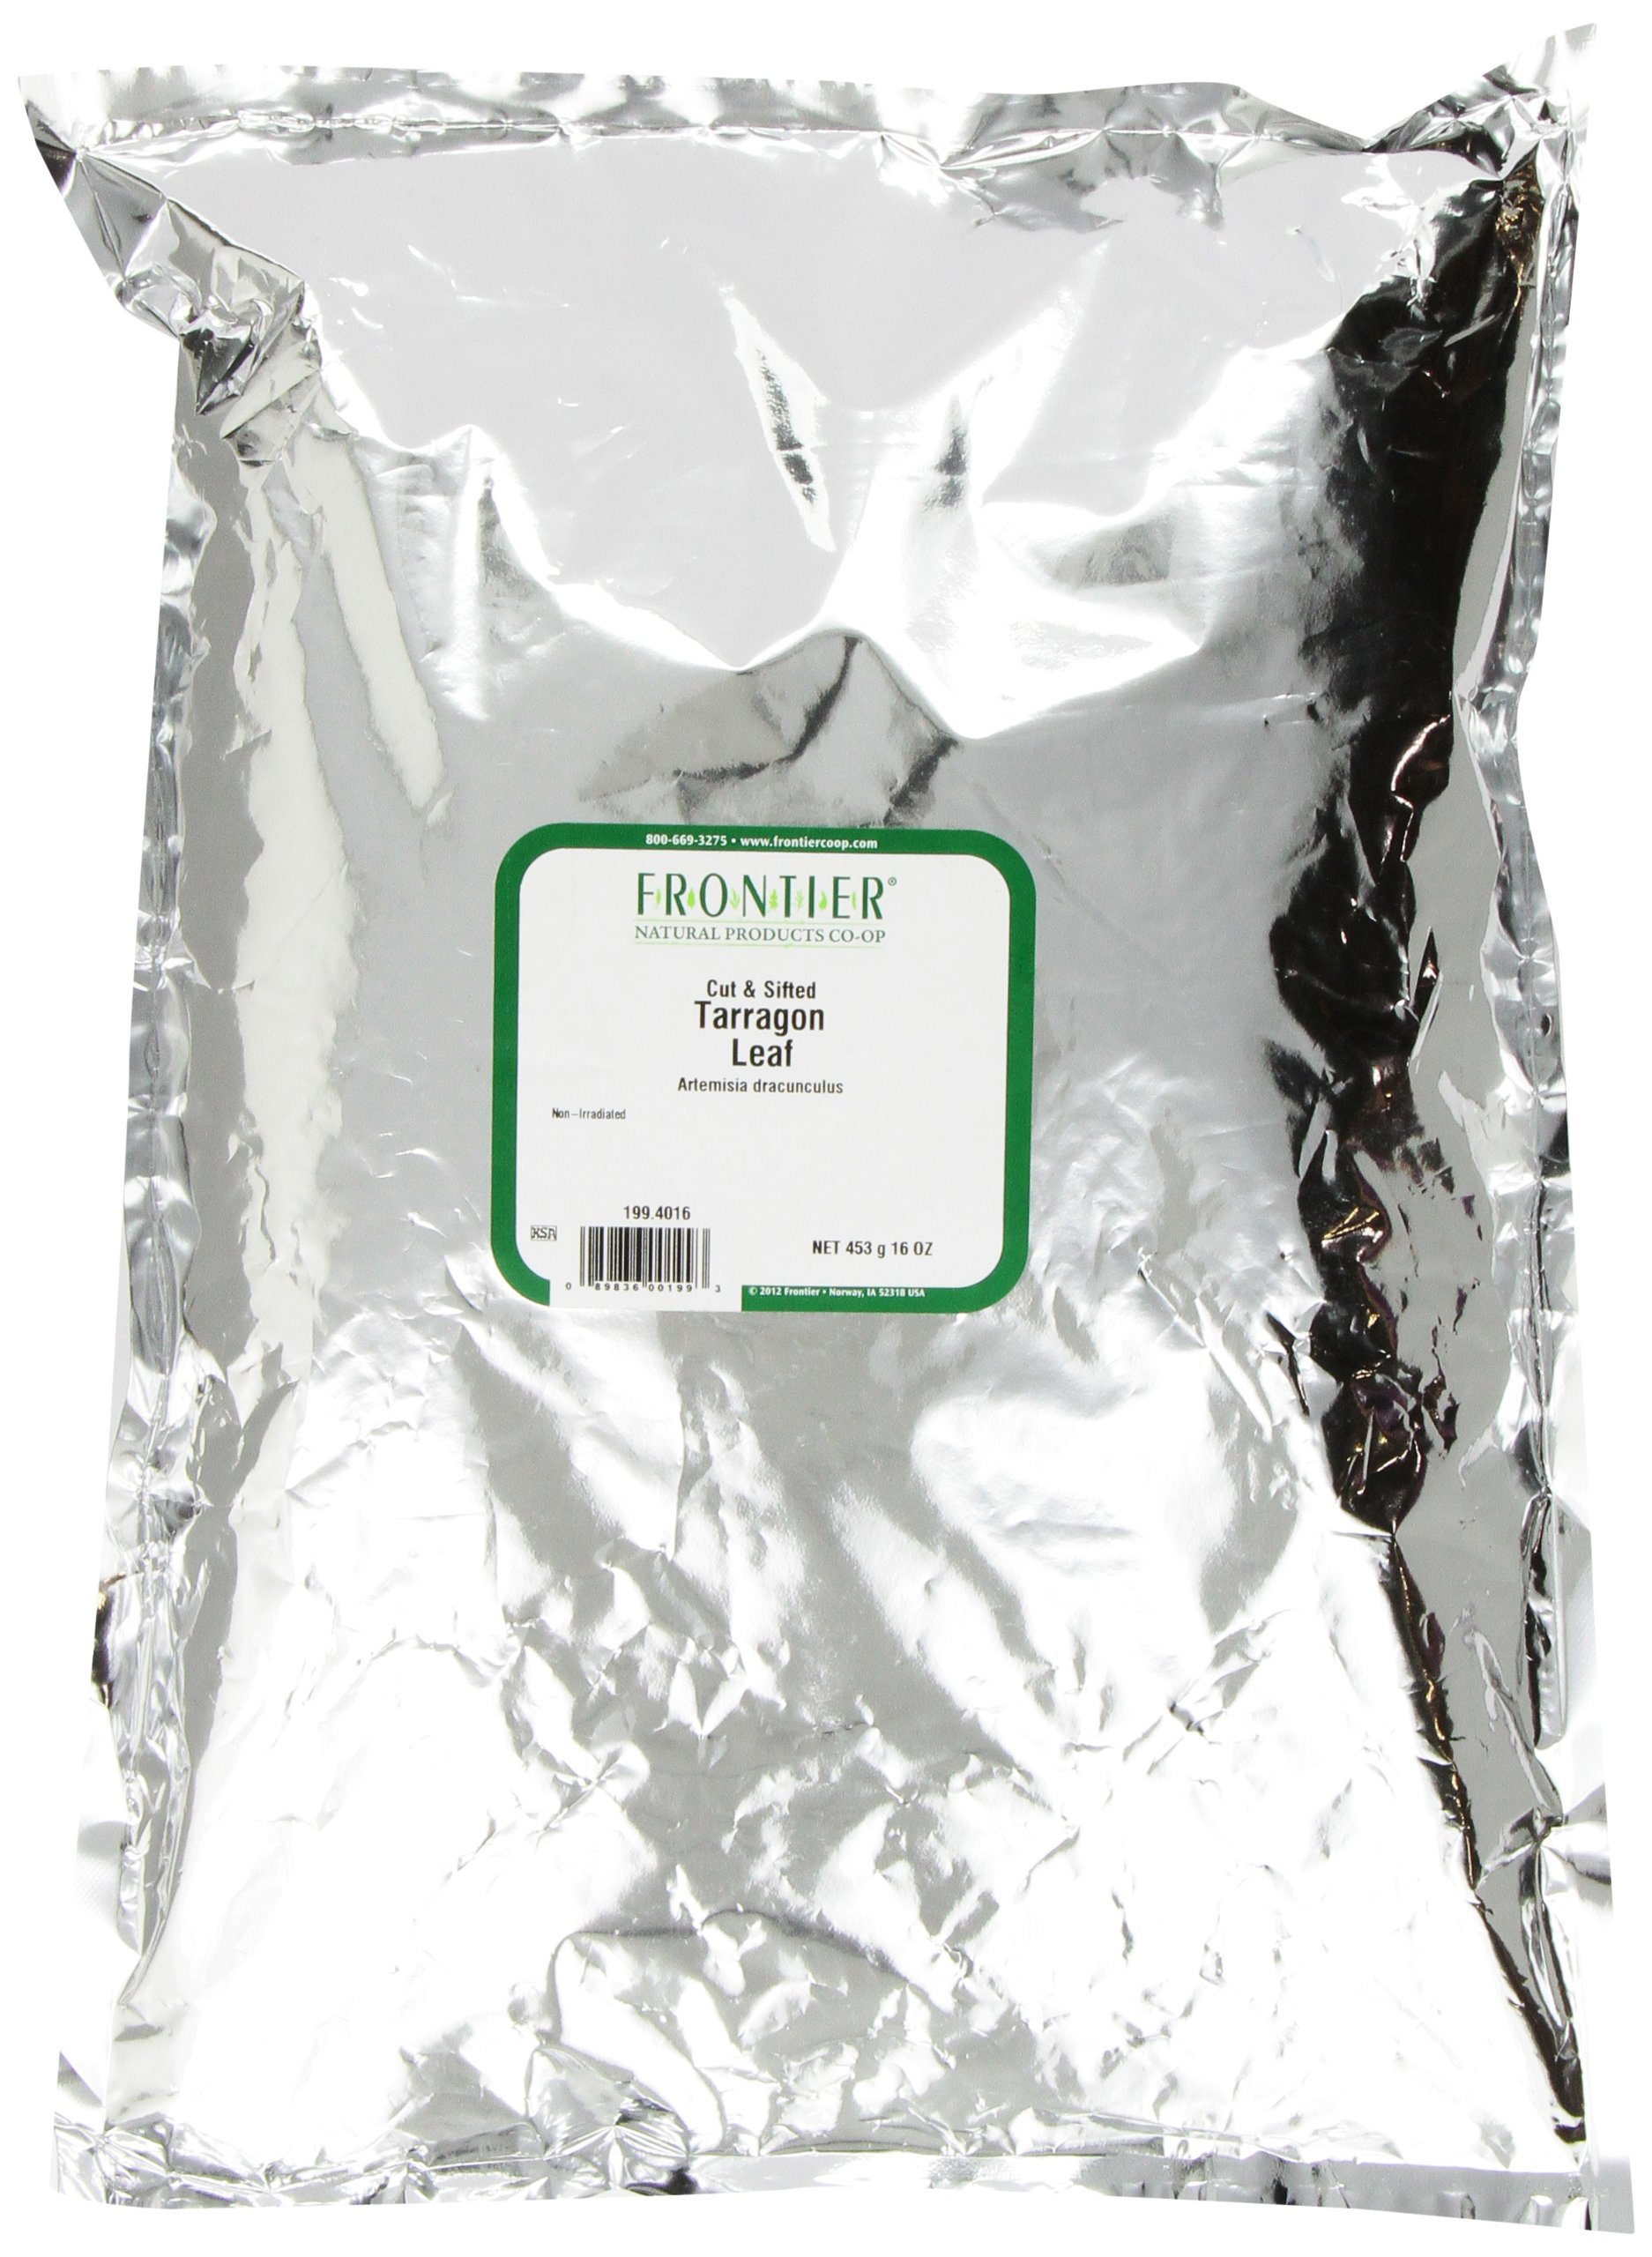 Frontier Tarragon Leaf C/s, 16 Ounce Bag